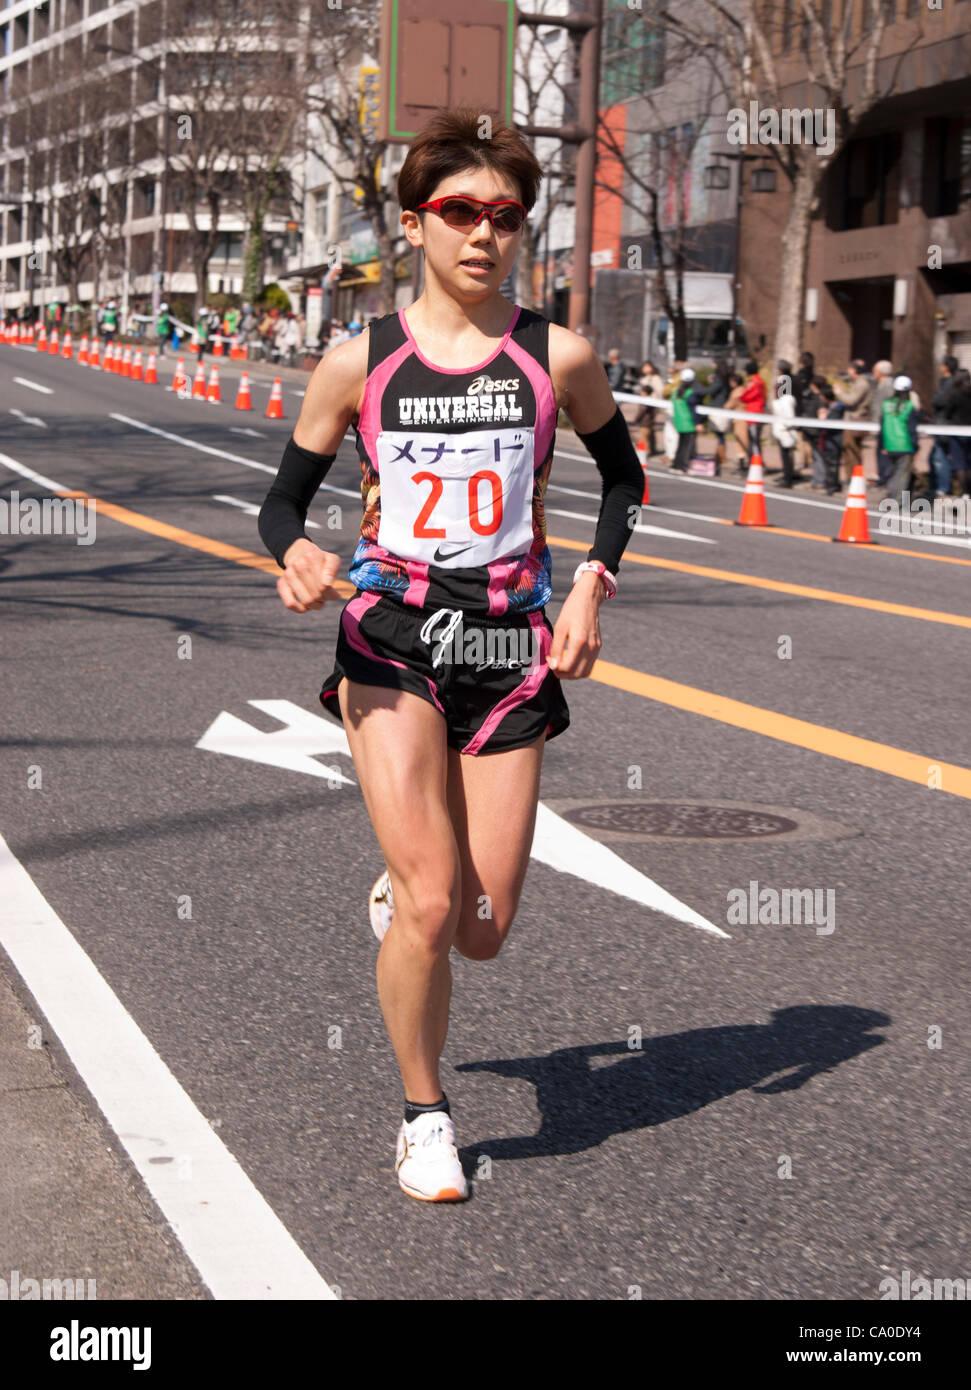 Kaoru Nagao (numéro 20) dans le Marathon de la femme de Nagoya, Nagoya, Japon, le 11 mars 2012 Photo Stock